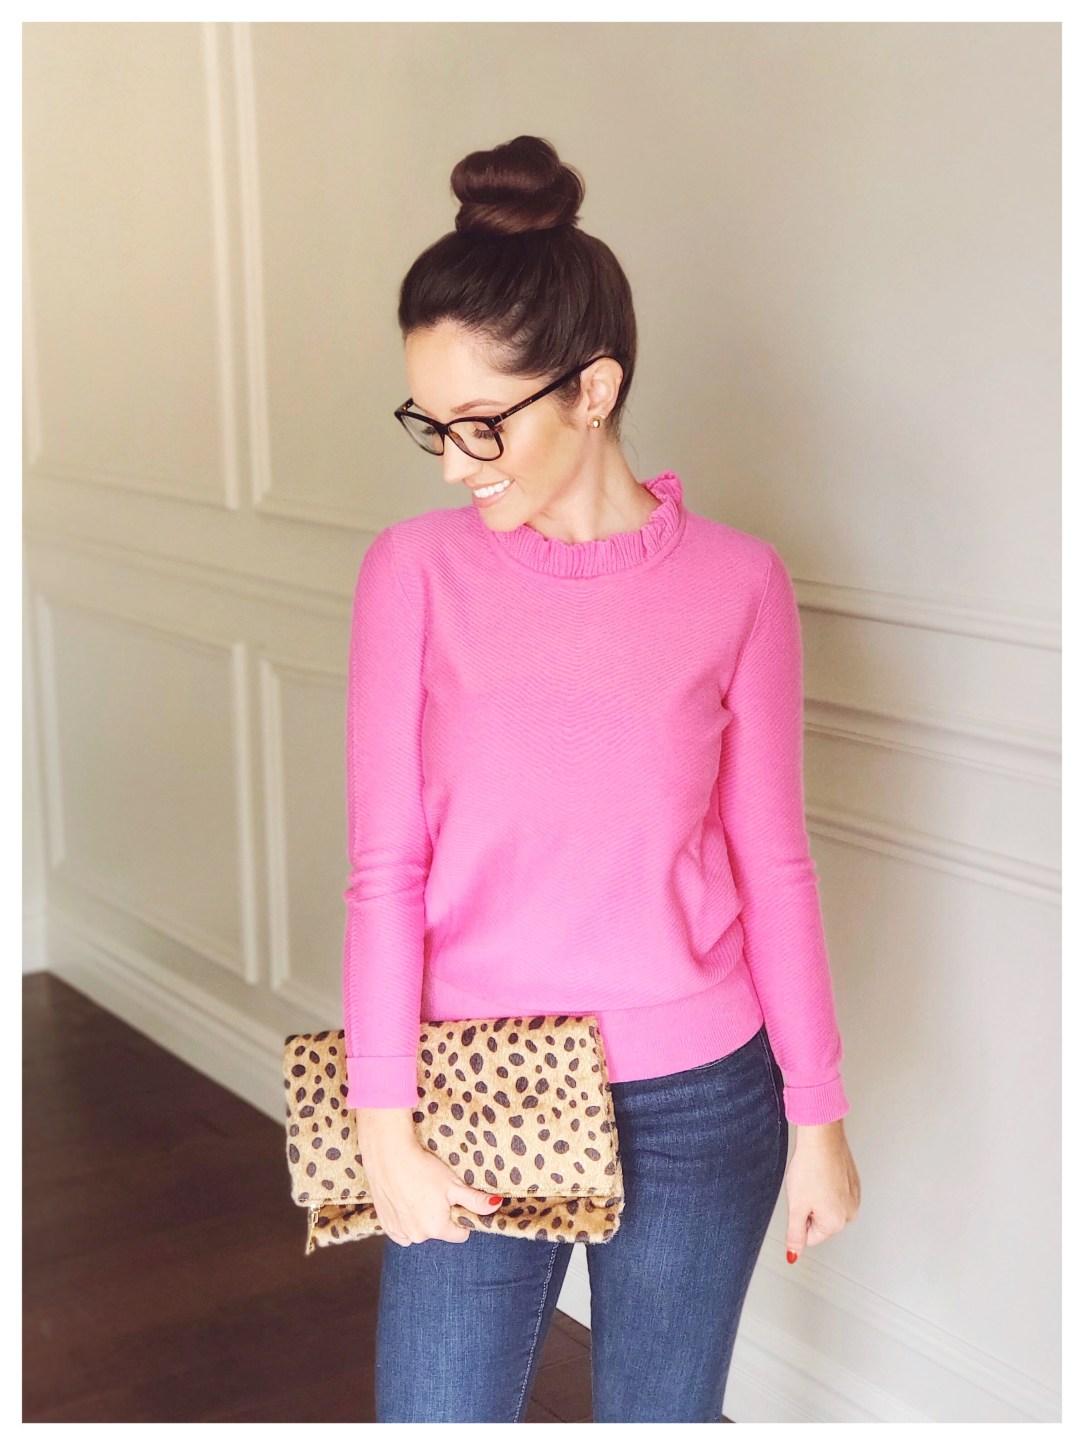 Petite Fashion Blogger Five Foot Feminine in JCrew Ruffle Neck Pullover